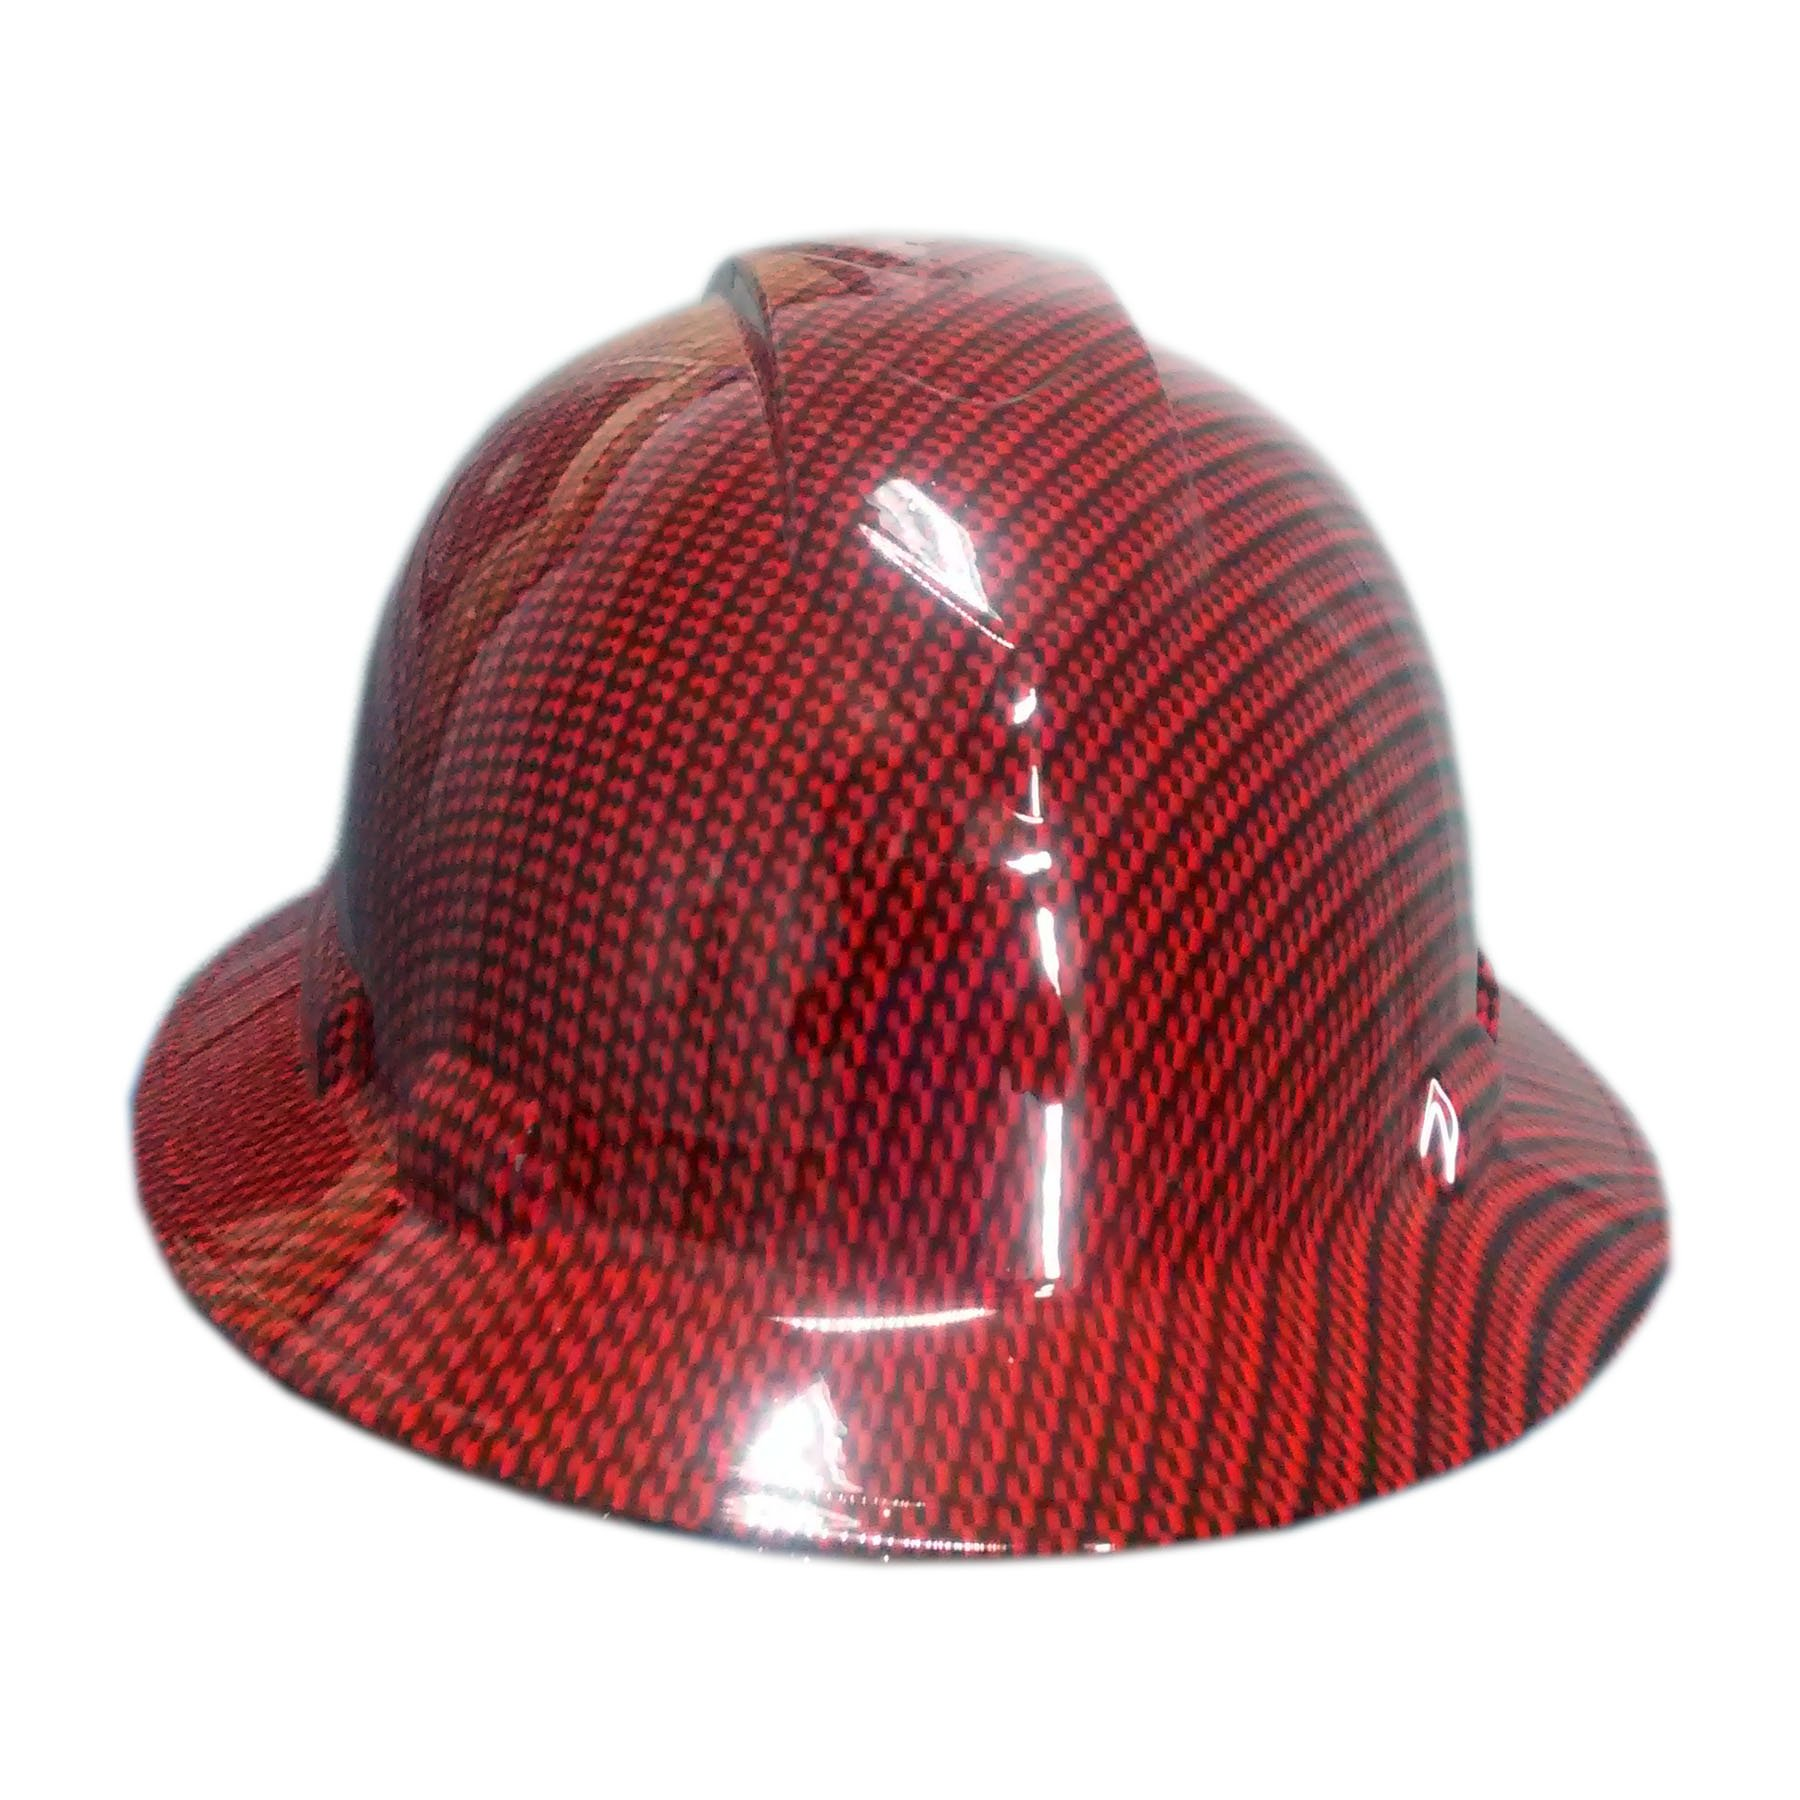 Izzo Graphics Red Carbon Fiber Pyramex Ridgeline Full Brim Hard Hat